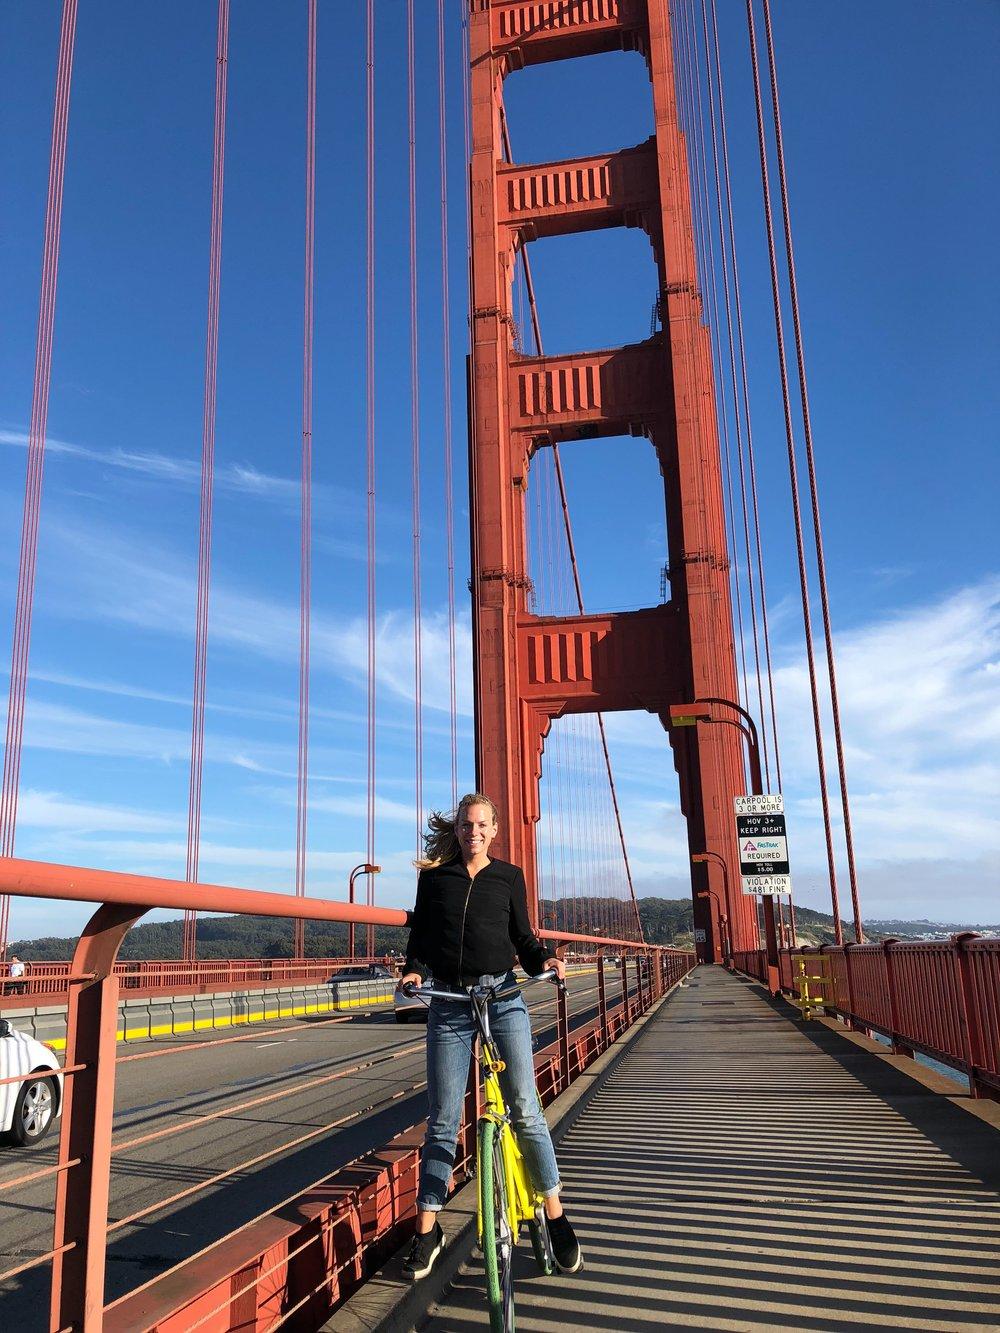 - Biking over the Golden Gate Bridge